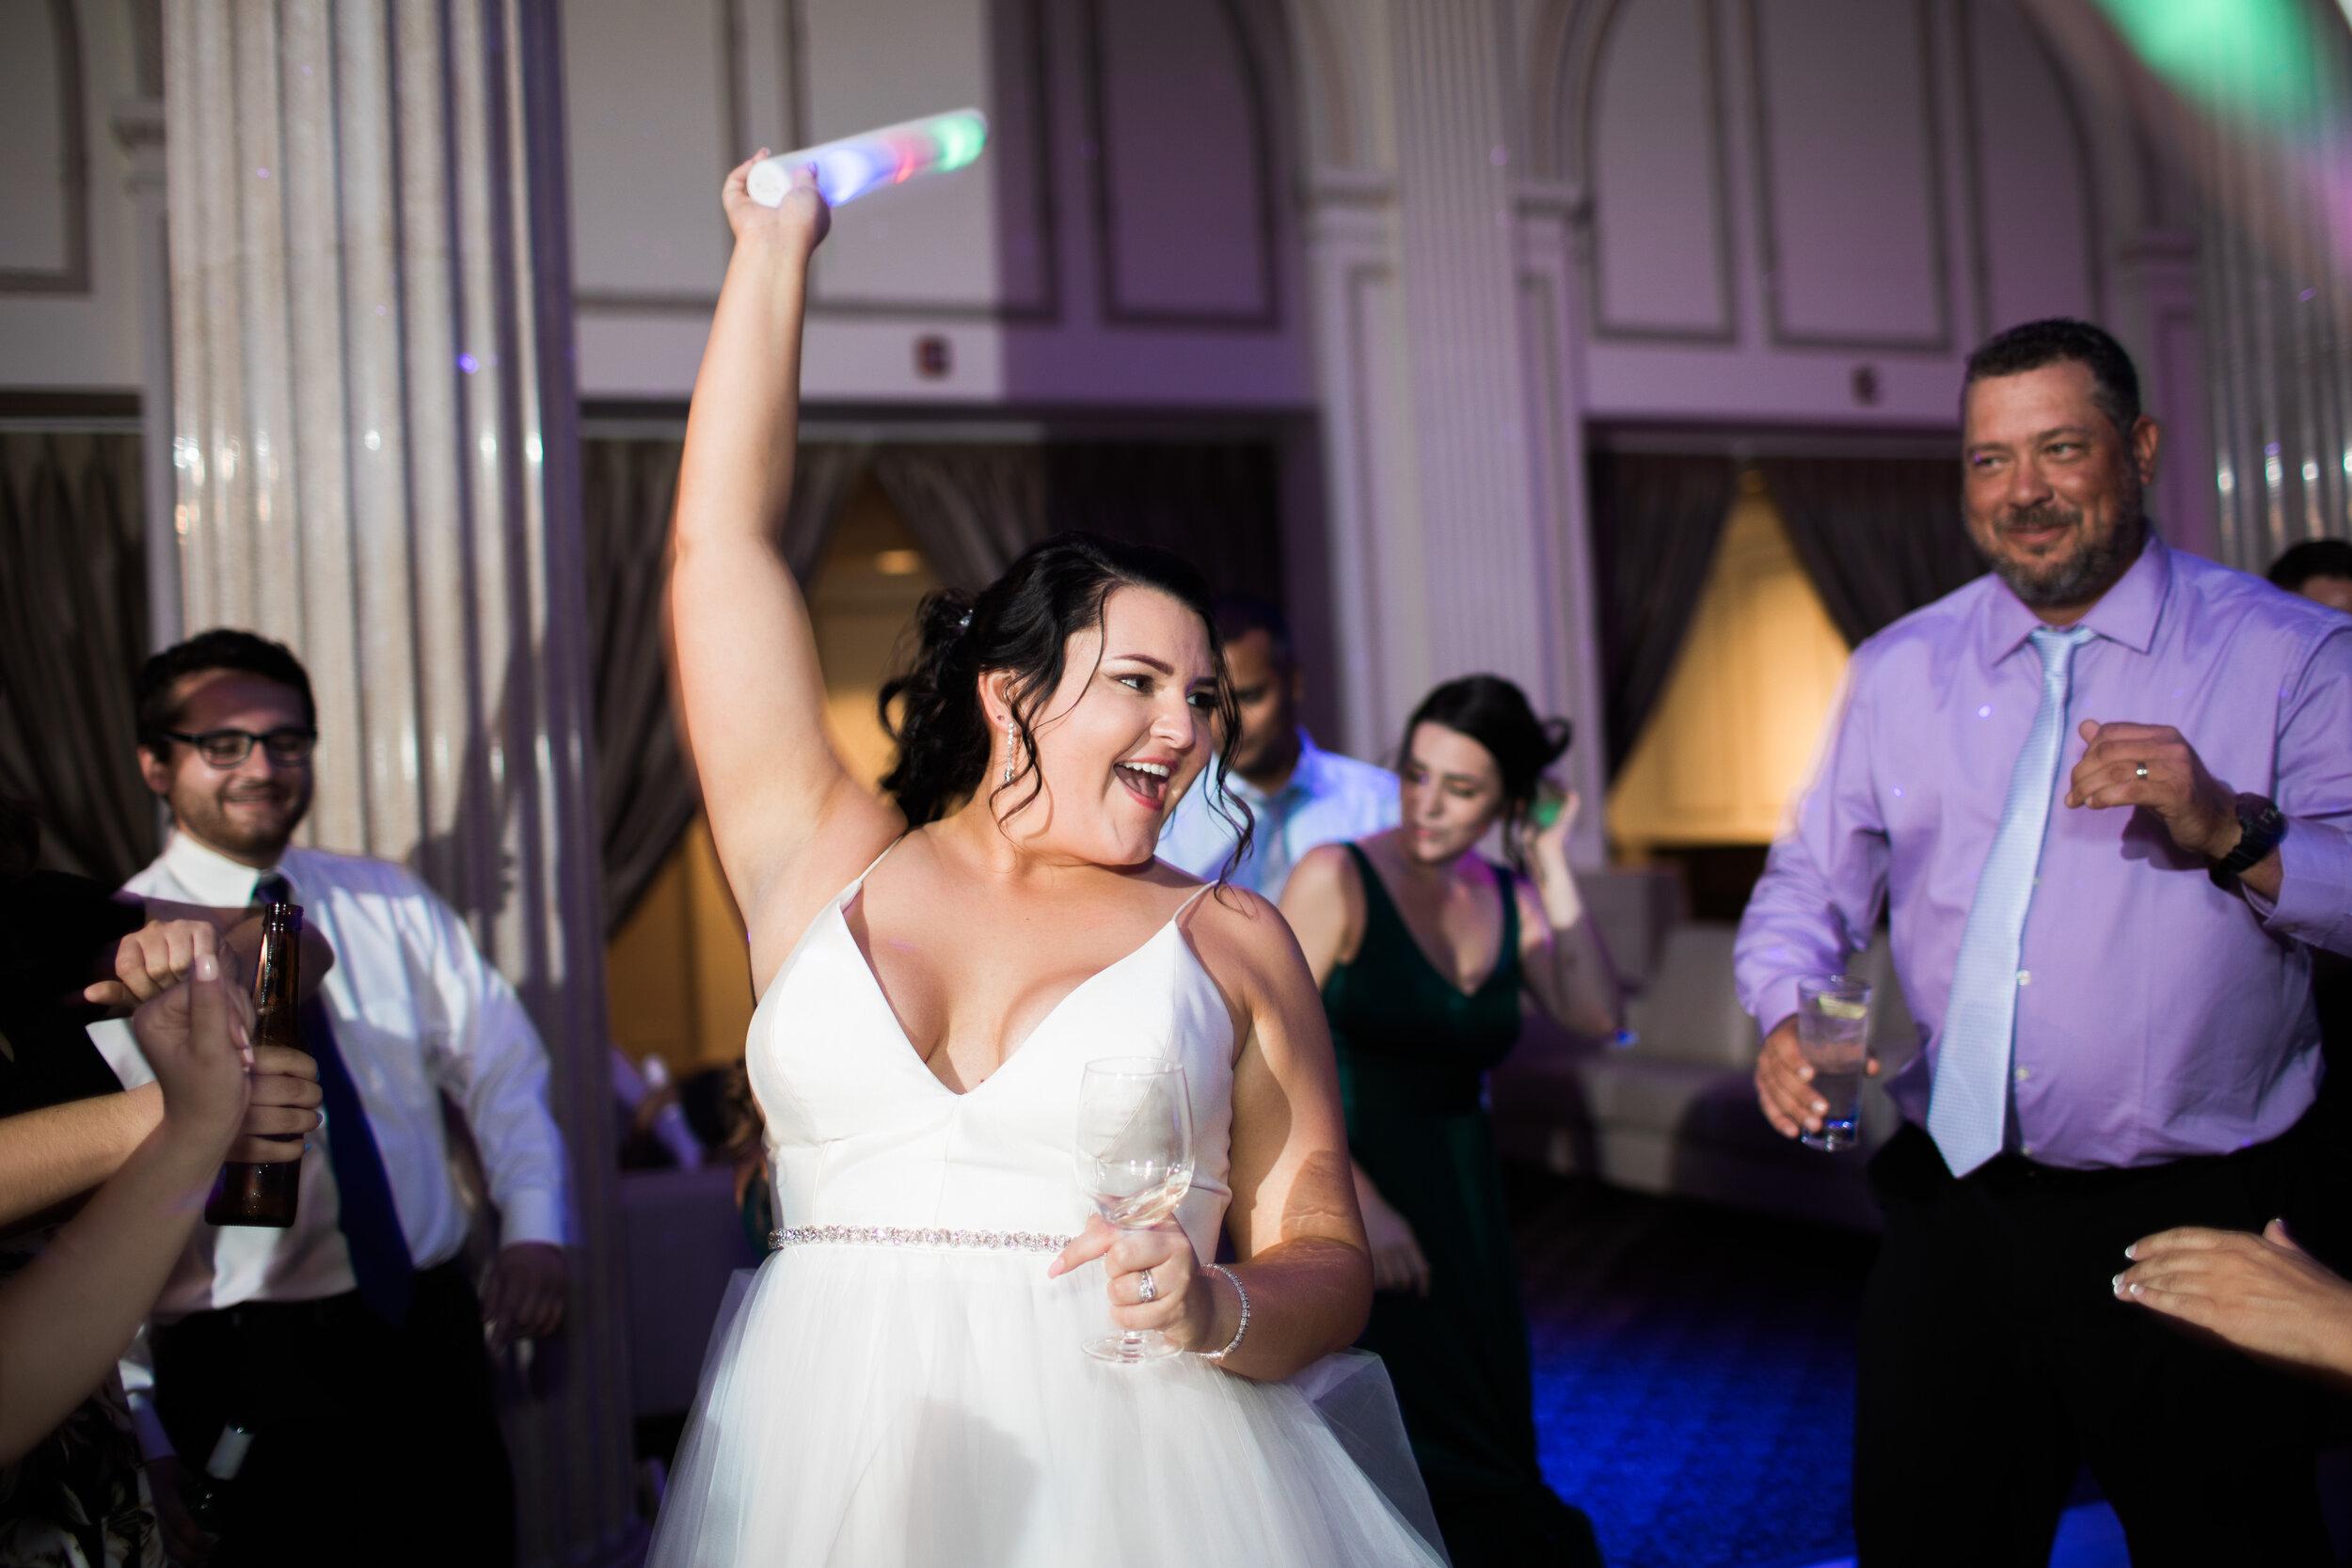 St_Augustine_Wedding_Photography_Treasury_on_the_Plaza_Wedding__0056_.jpg